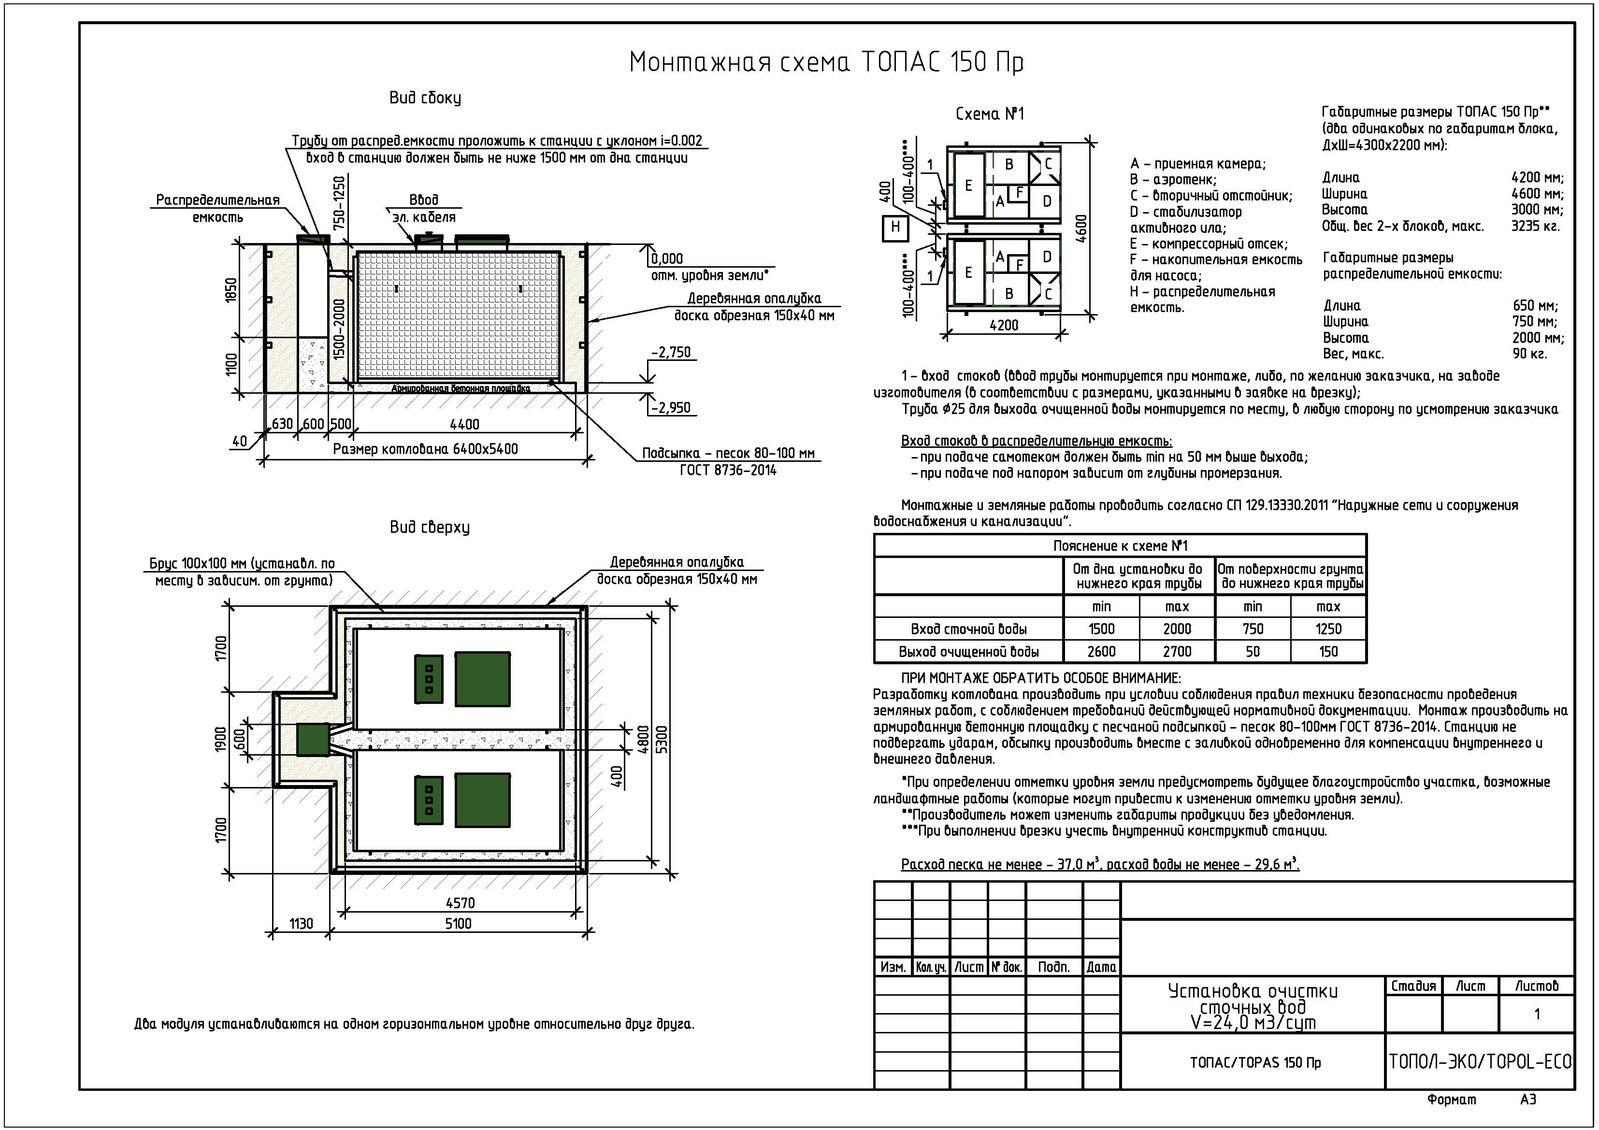 Монтажная схема септика Топас 150 ПР